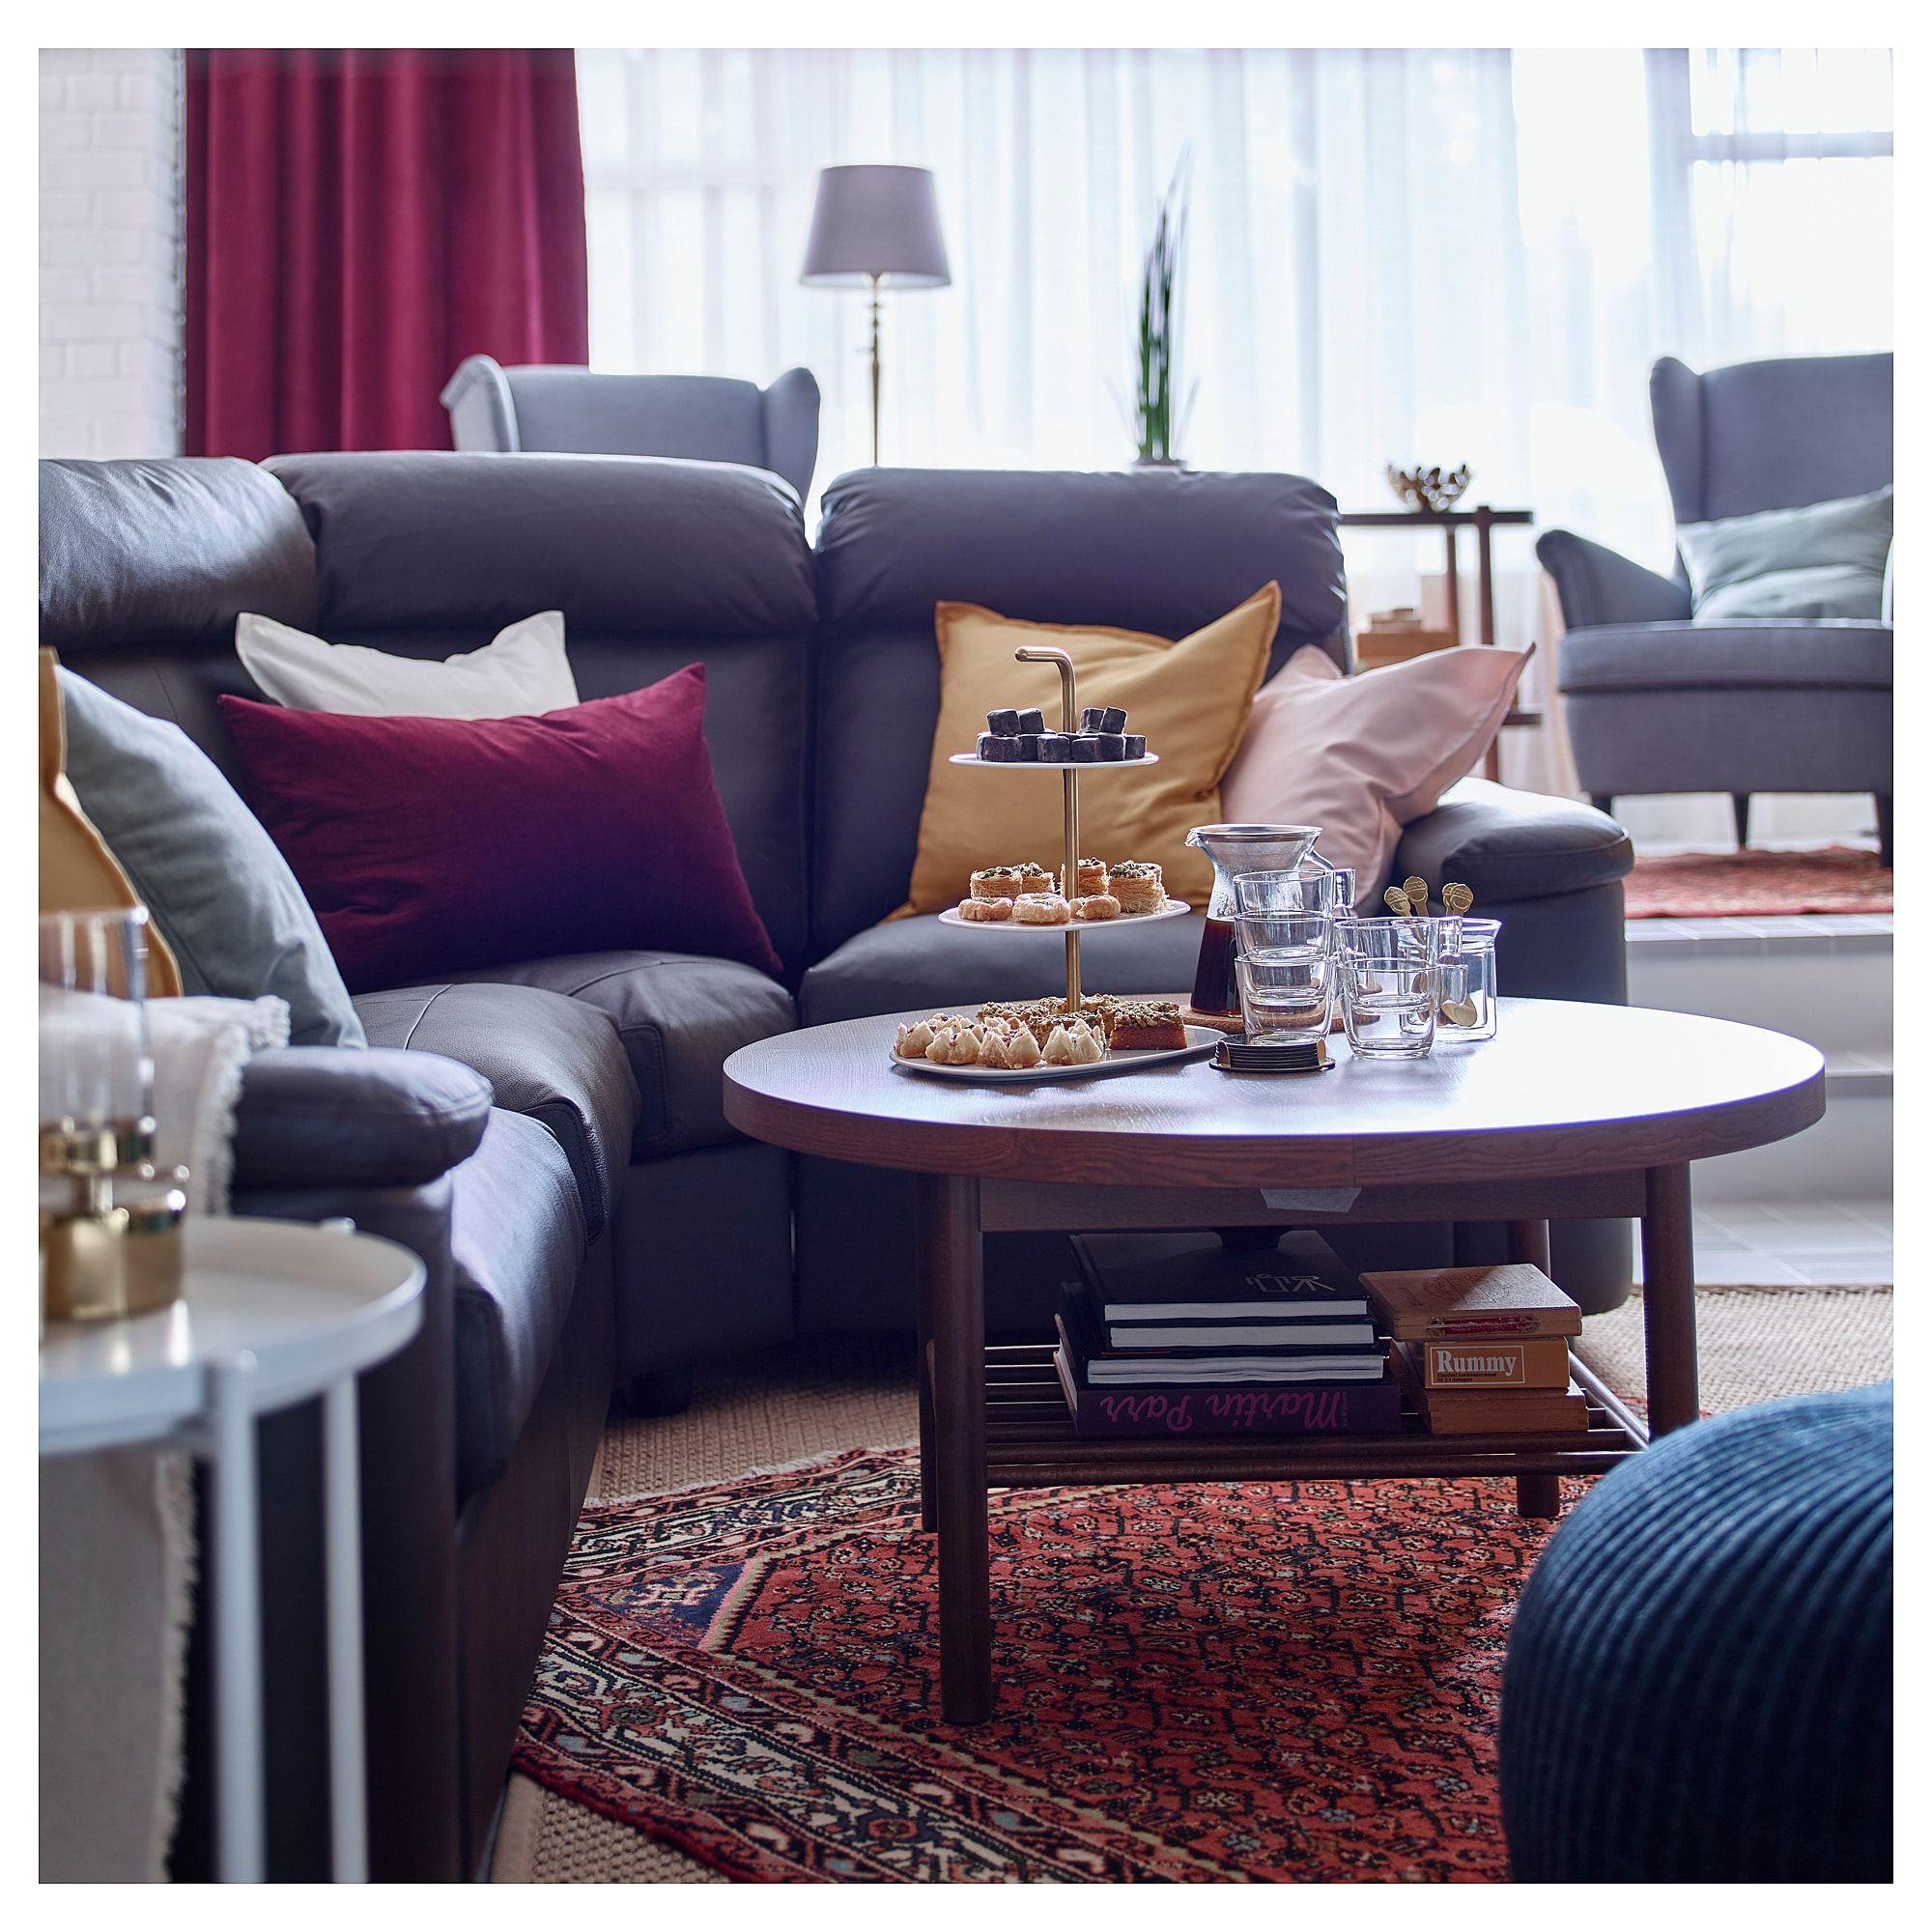 IKEA LISTERBY Coffee table brown Light blue sofa